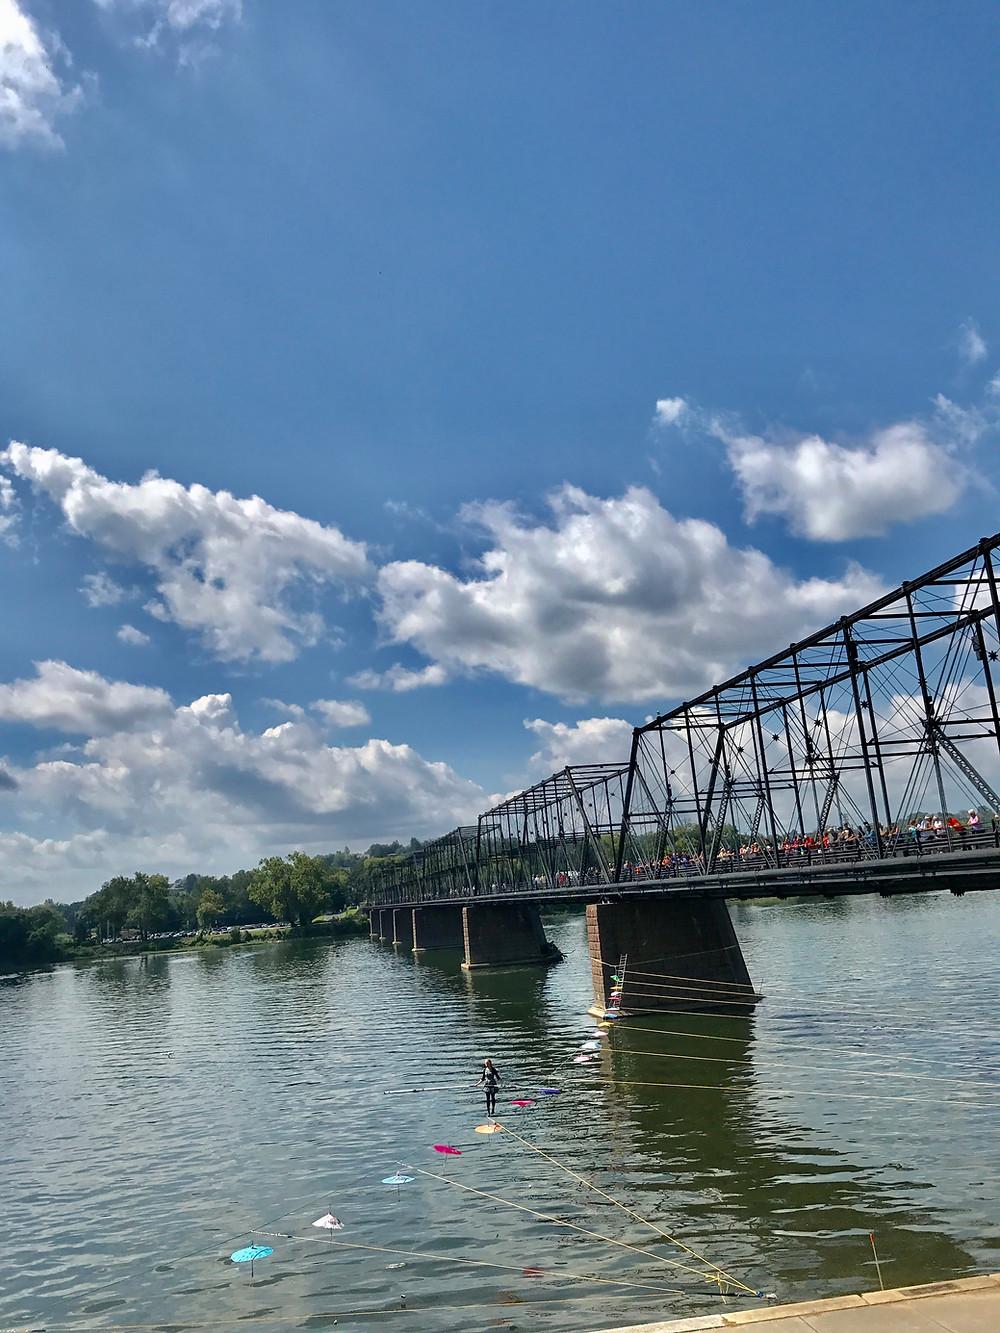 Tightrope, Harrisburg city island, Walnut Street Pedestrian Bridge, Curious G and Me, Harrisburg with kids, choo choo train, City Island carousel